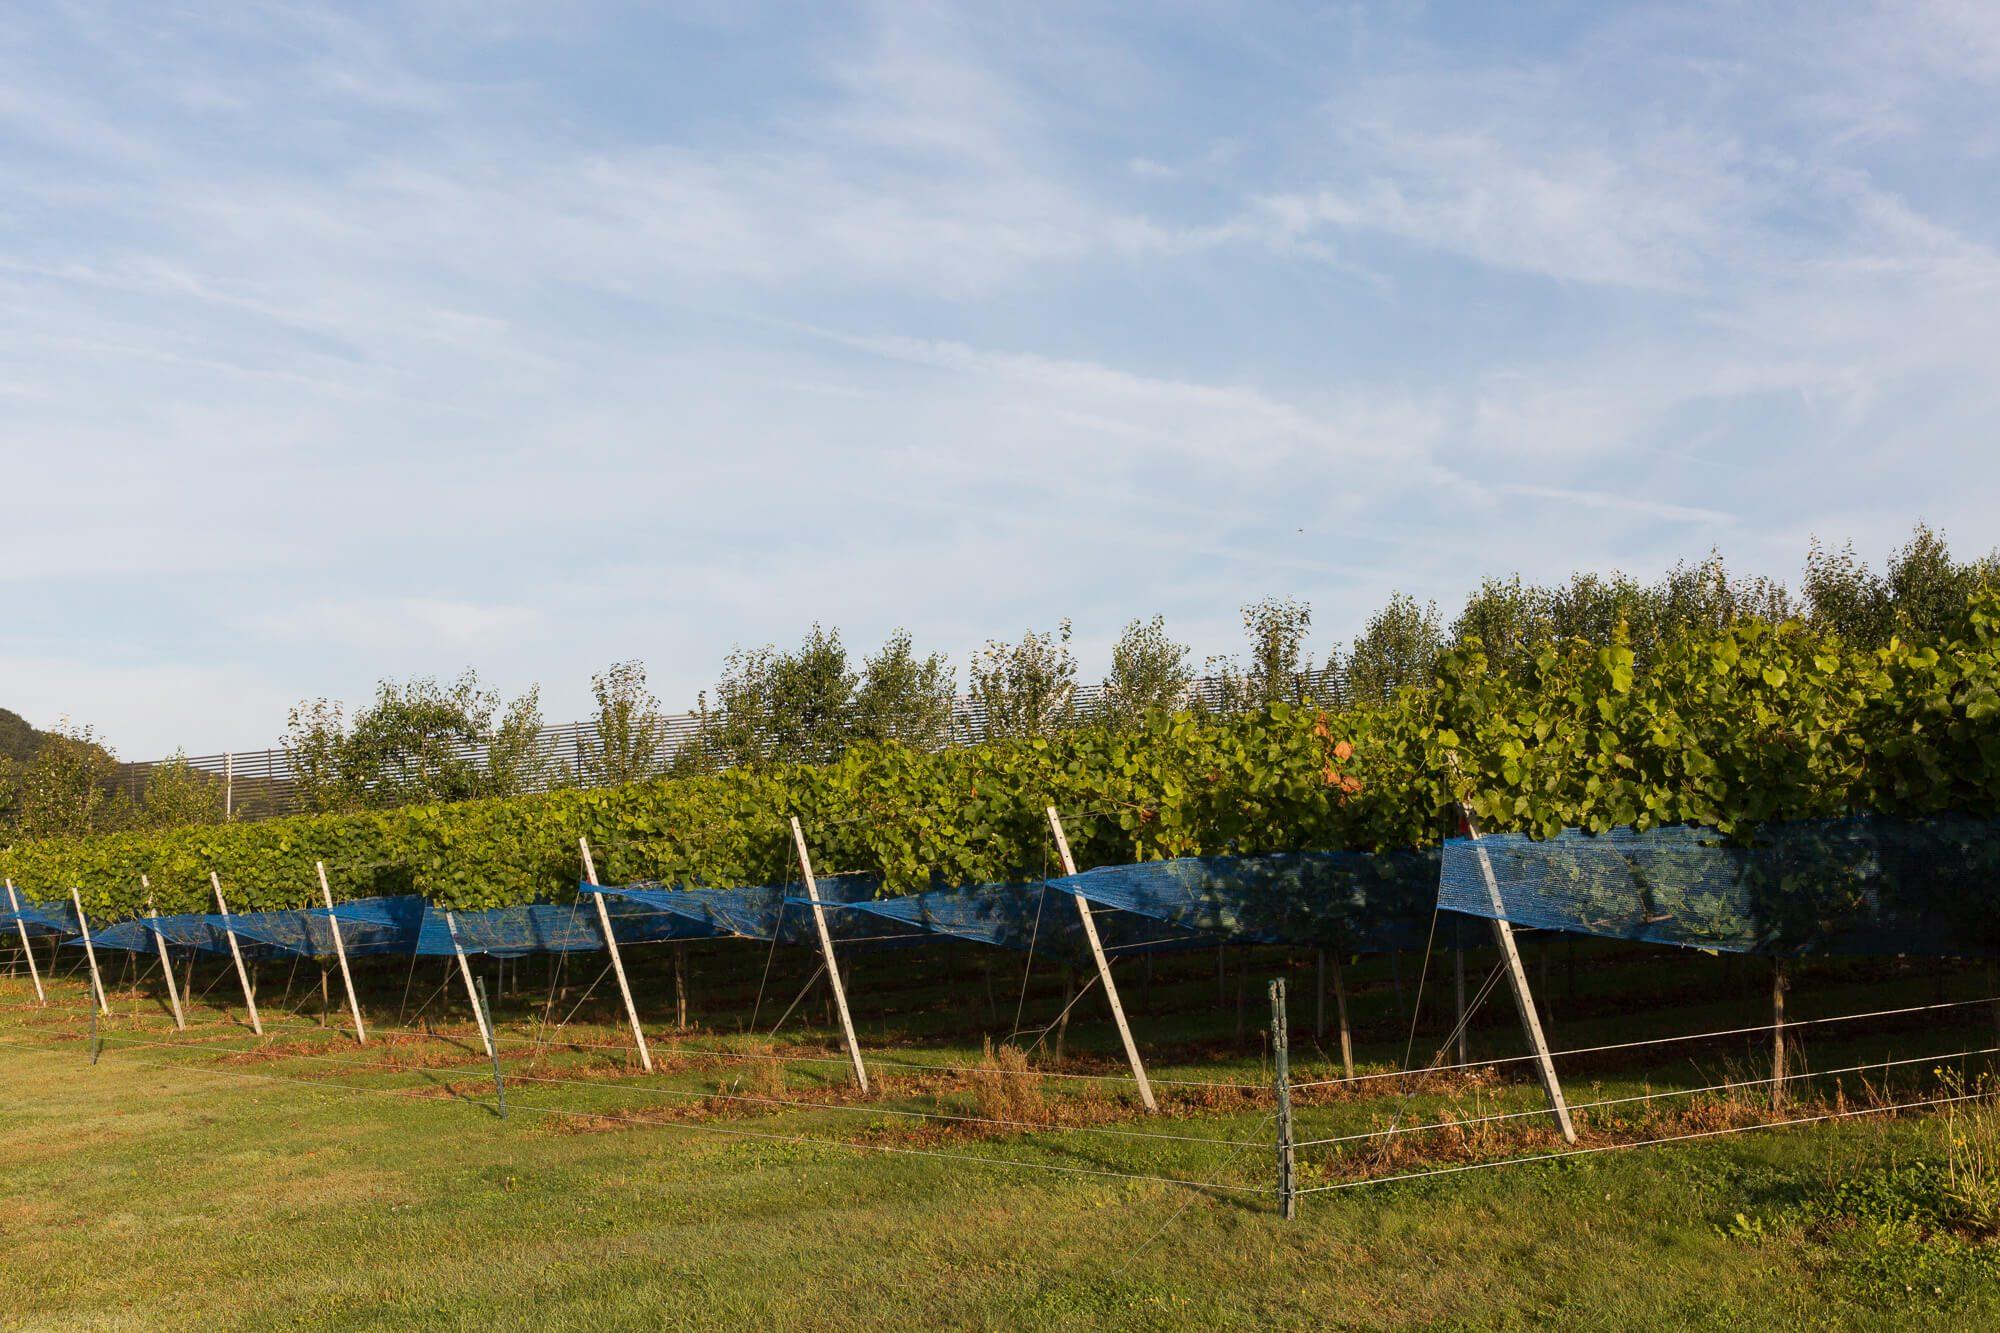 Vines in Netting